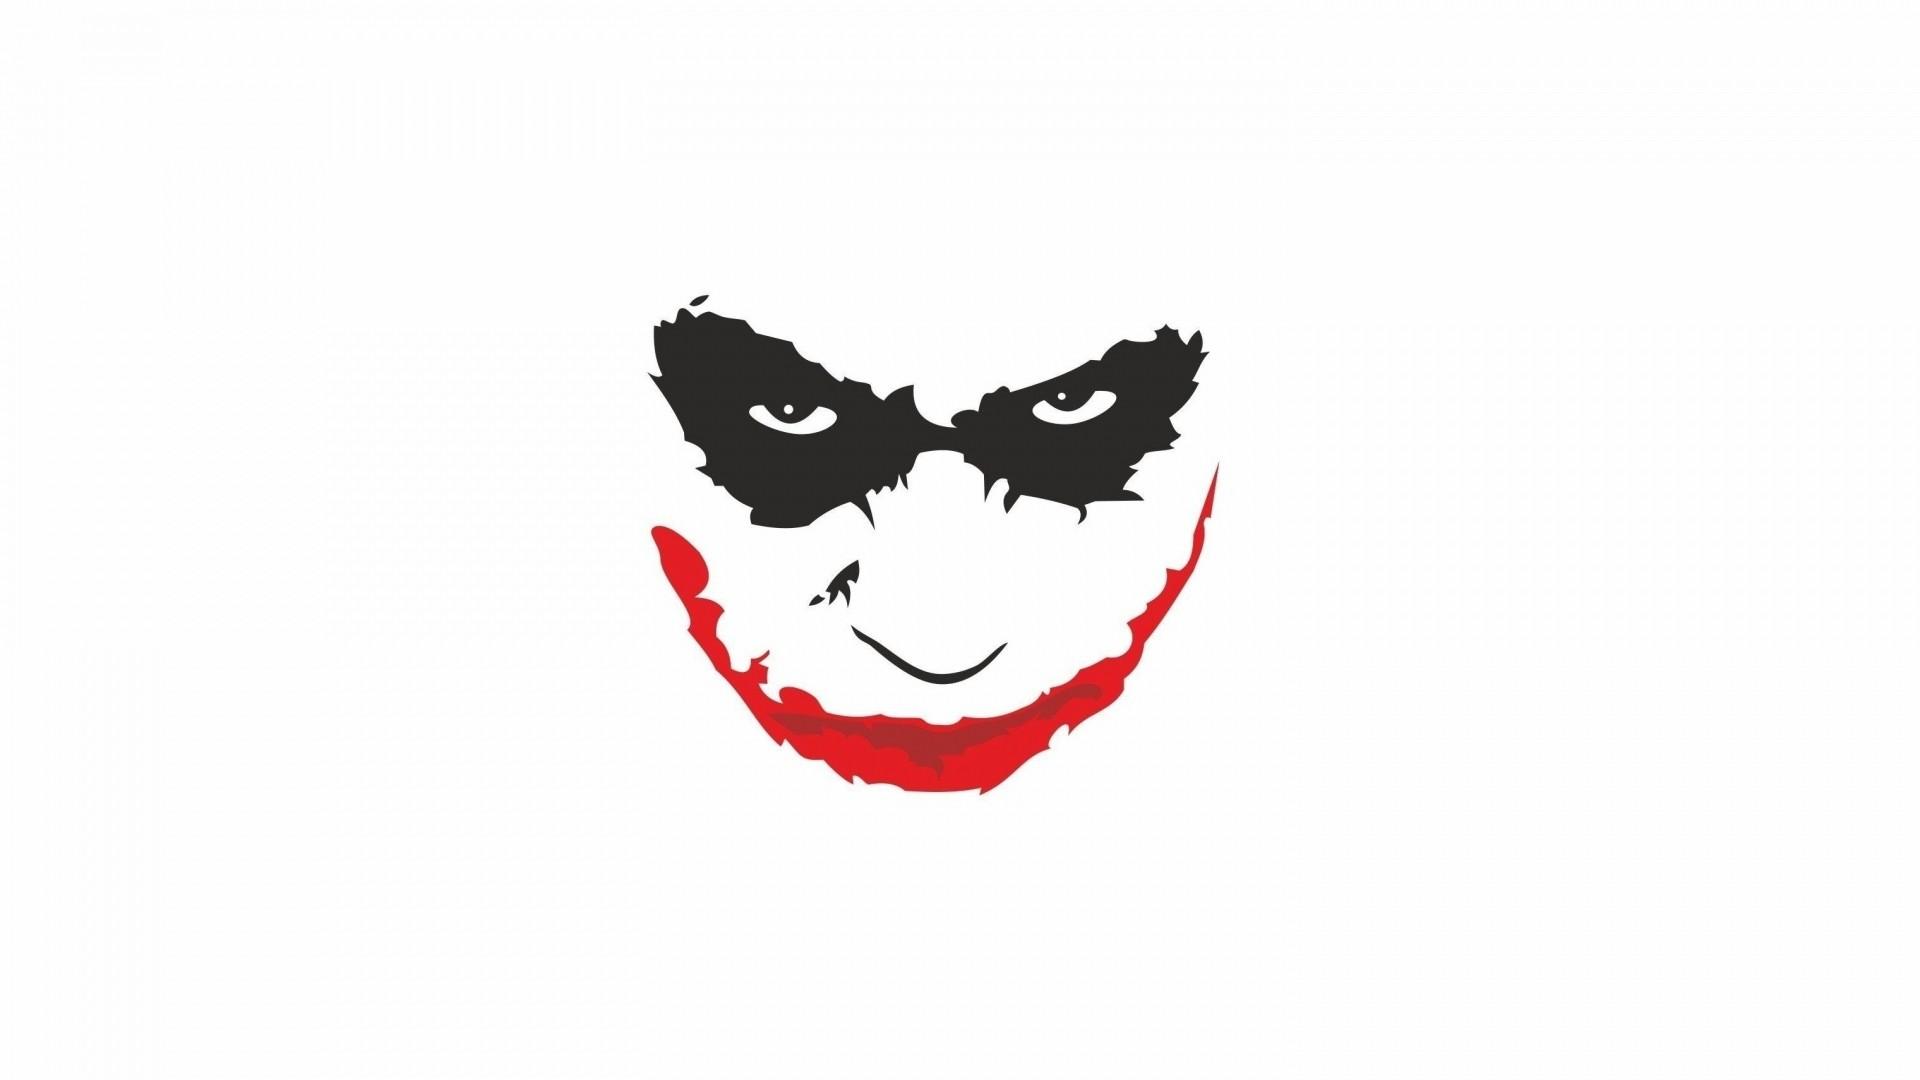 Batman Wallpaper Hd 1920x1080 Heath Ledger Joker Wallpaper Hd 79 Images